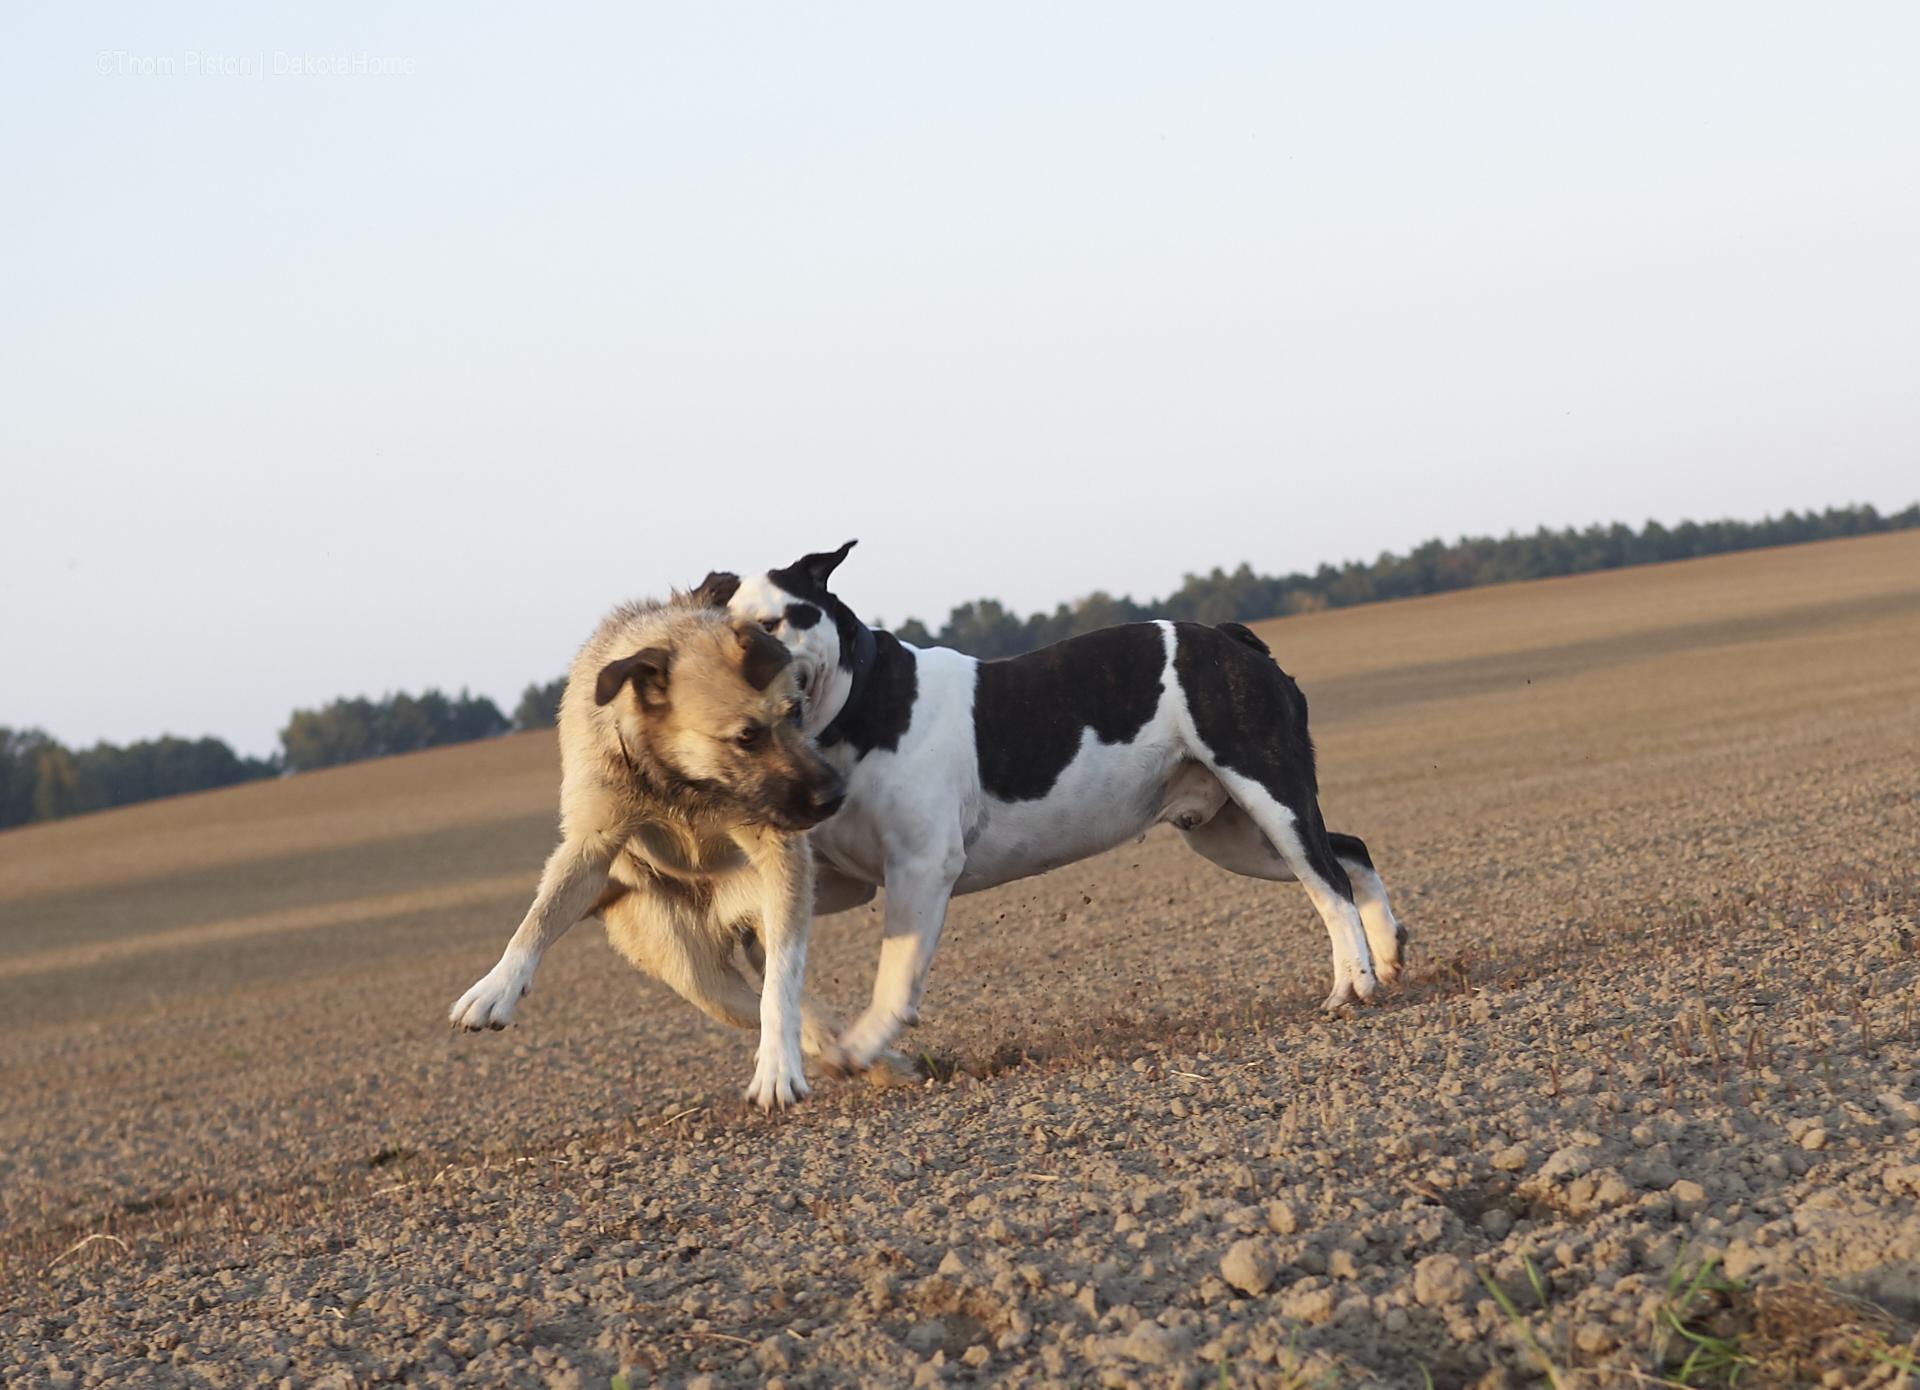 olympus, olympusomd, wildlifephotographie, animalphoto, naturfotografie,bulldoggen foto